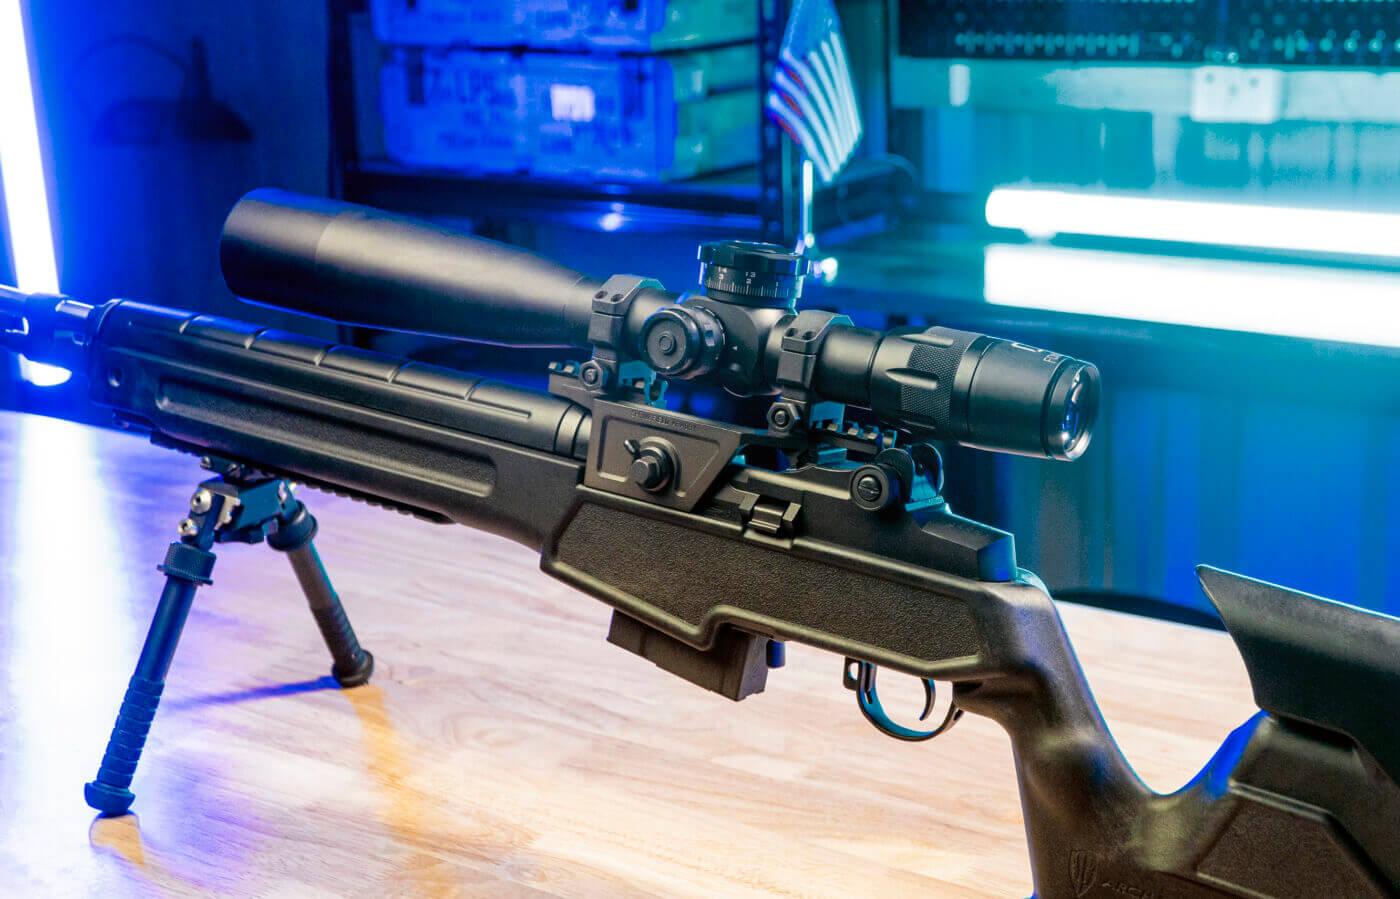 Scope mounted on M1A rifle